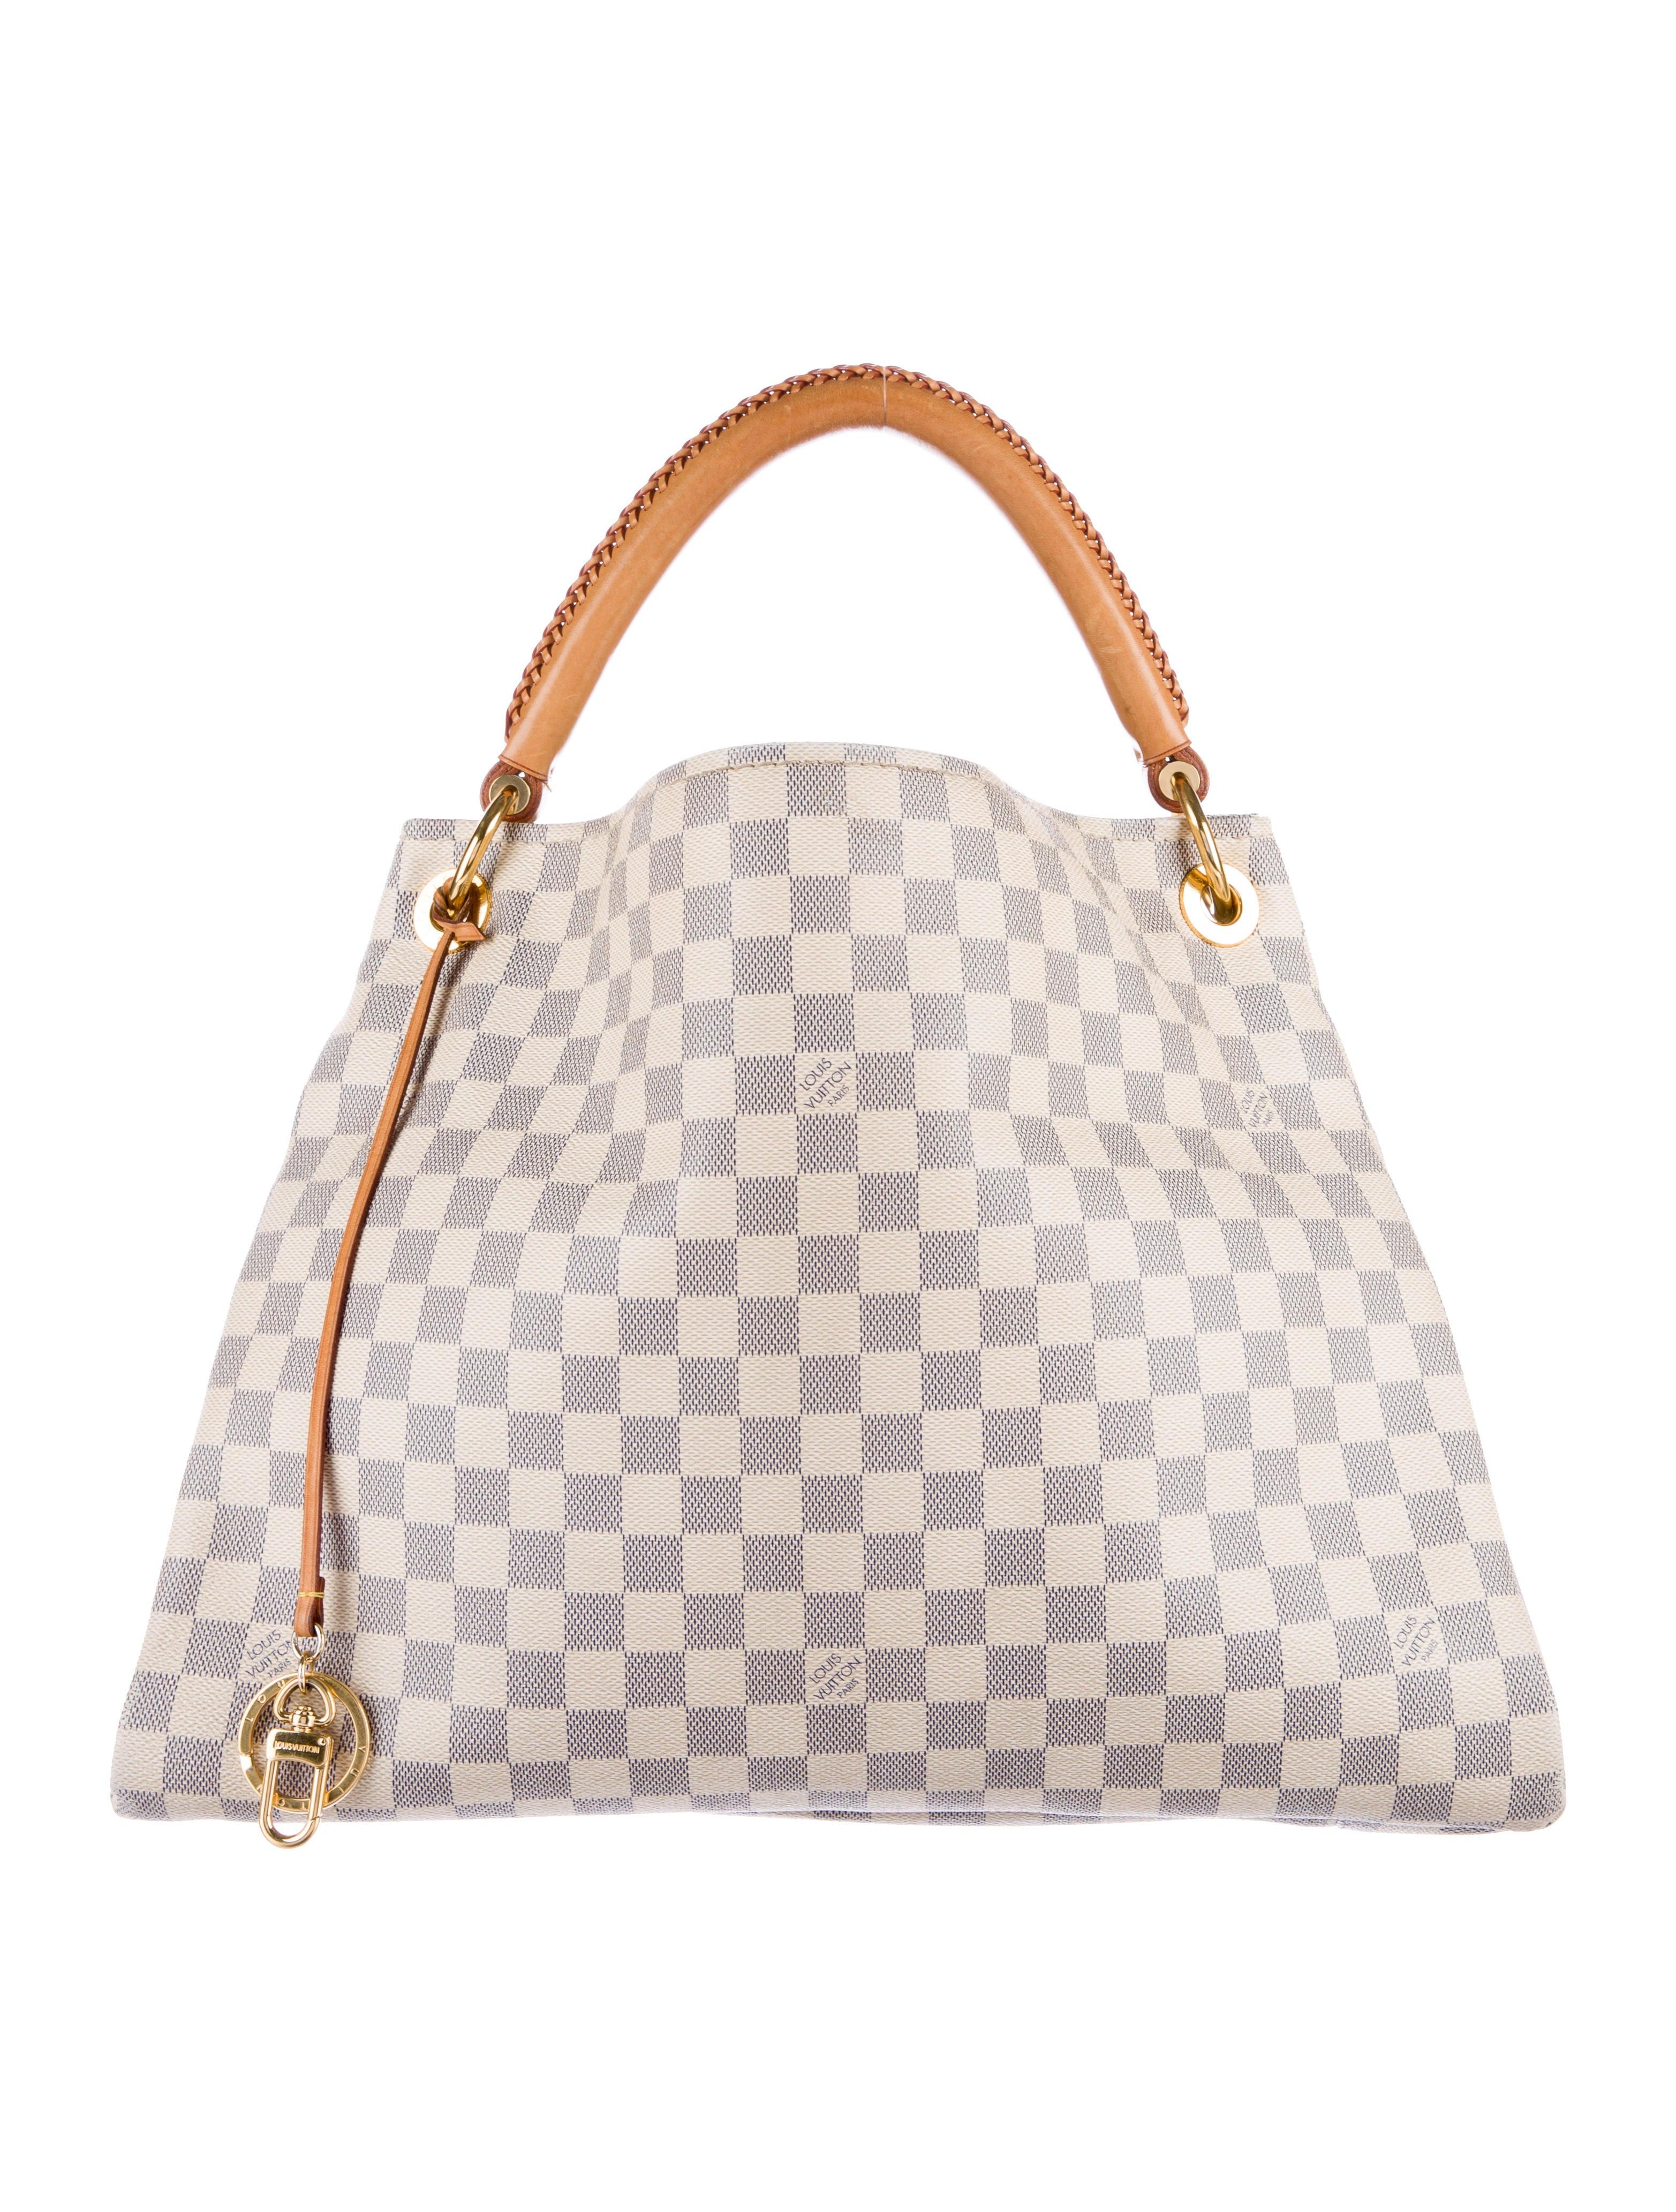 Women · Handbags  Louis Vuitton Damier Artsy MM. Damier Artsy MM afebe81e8